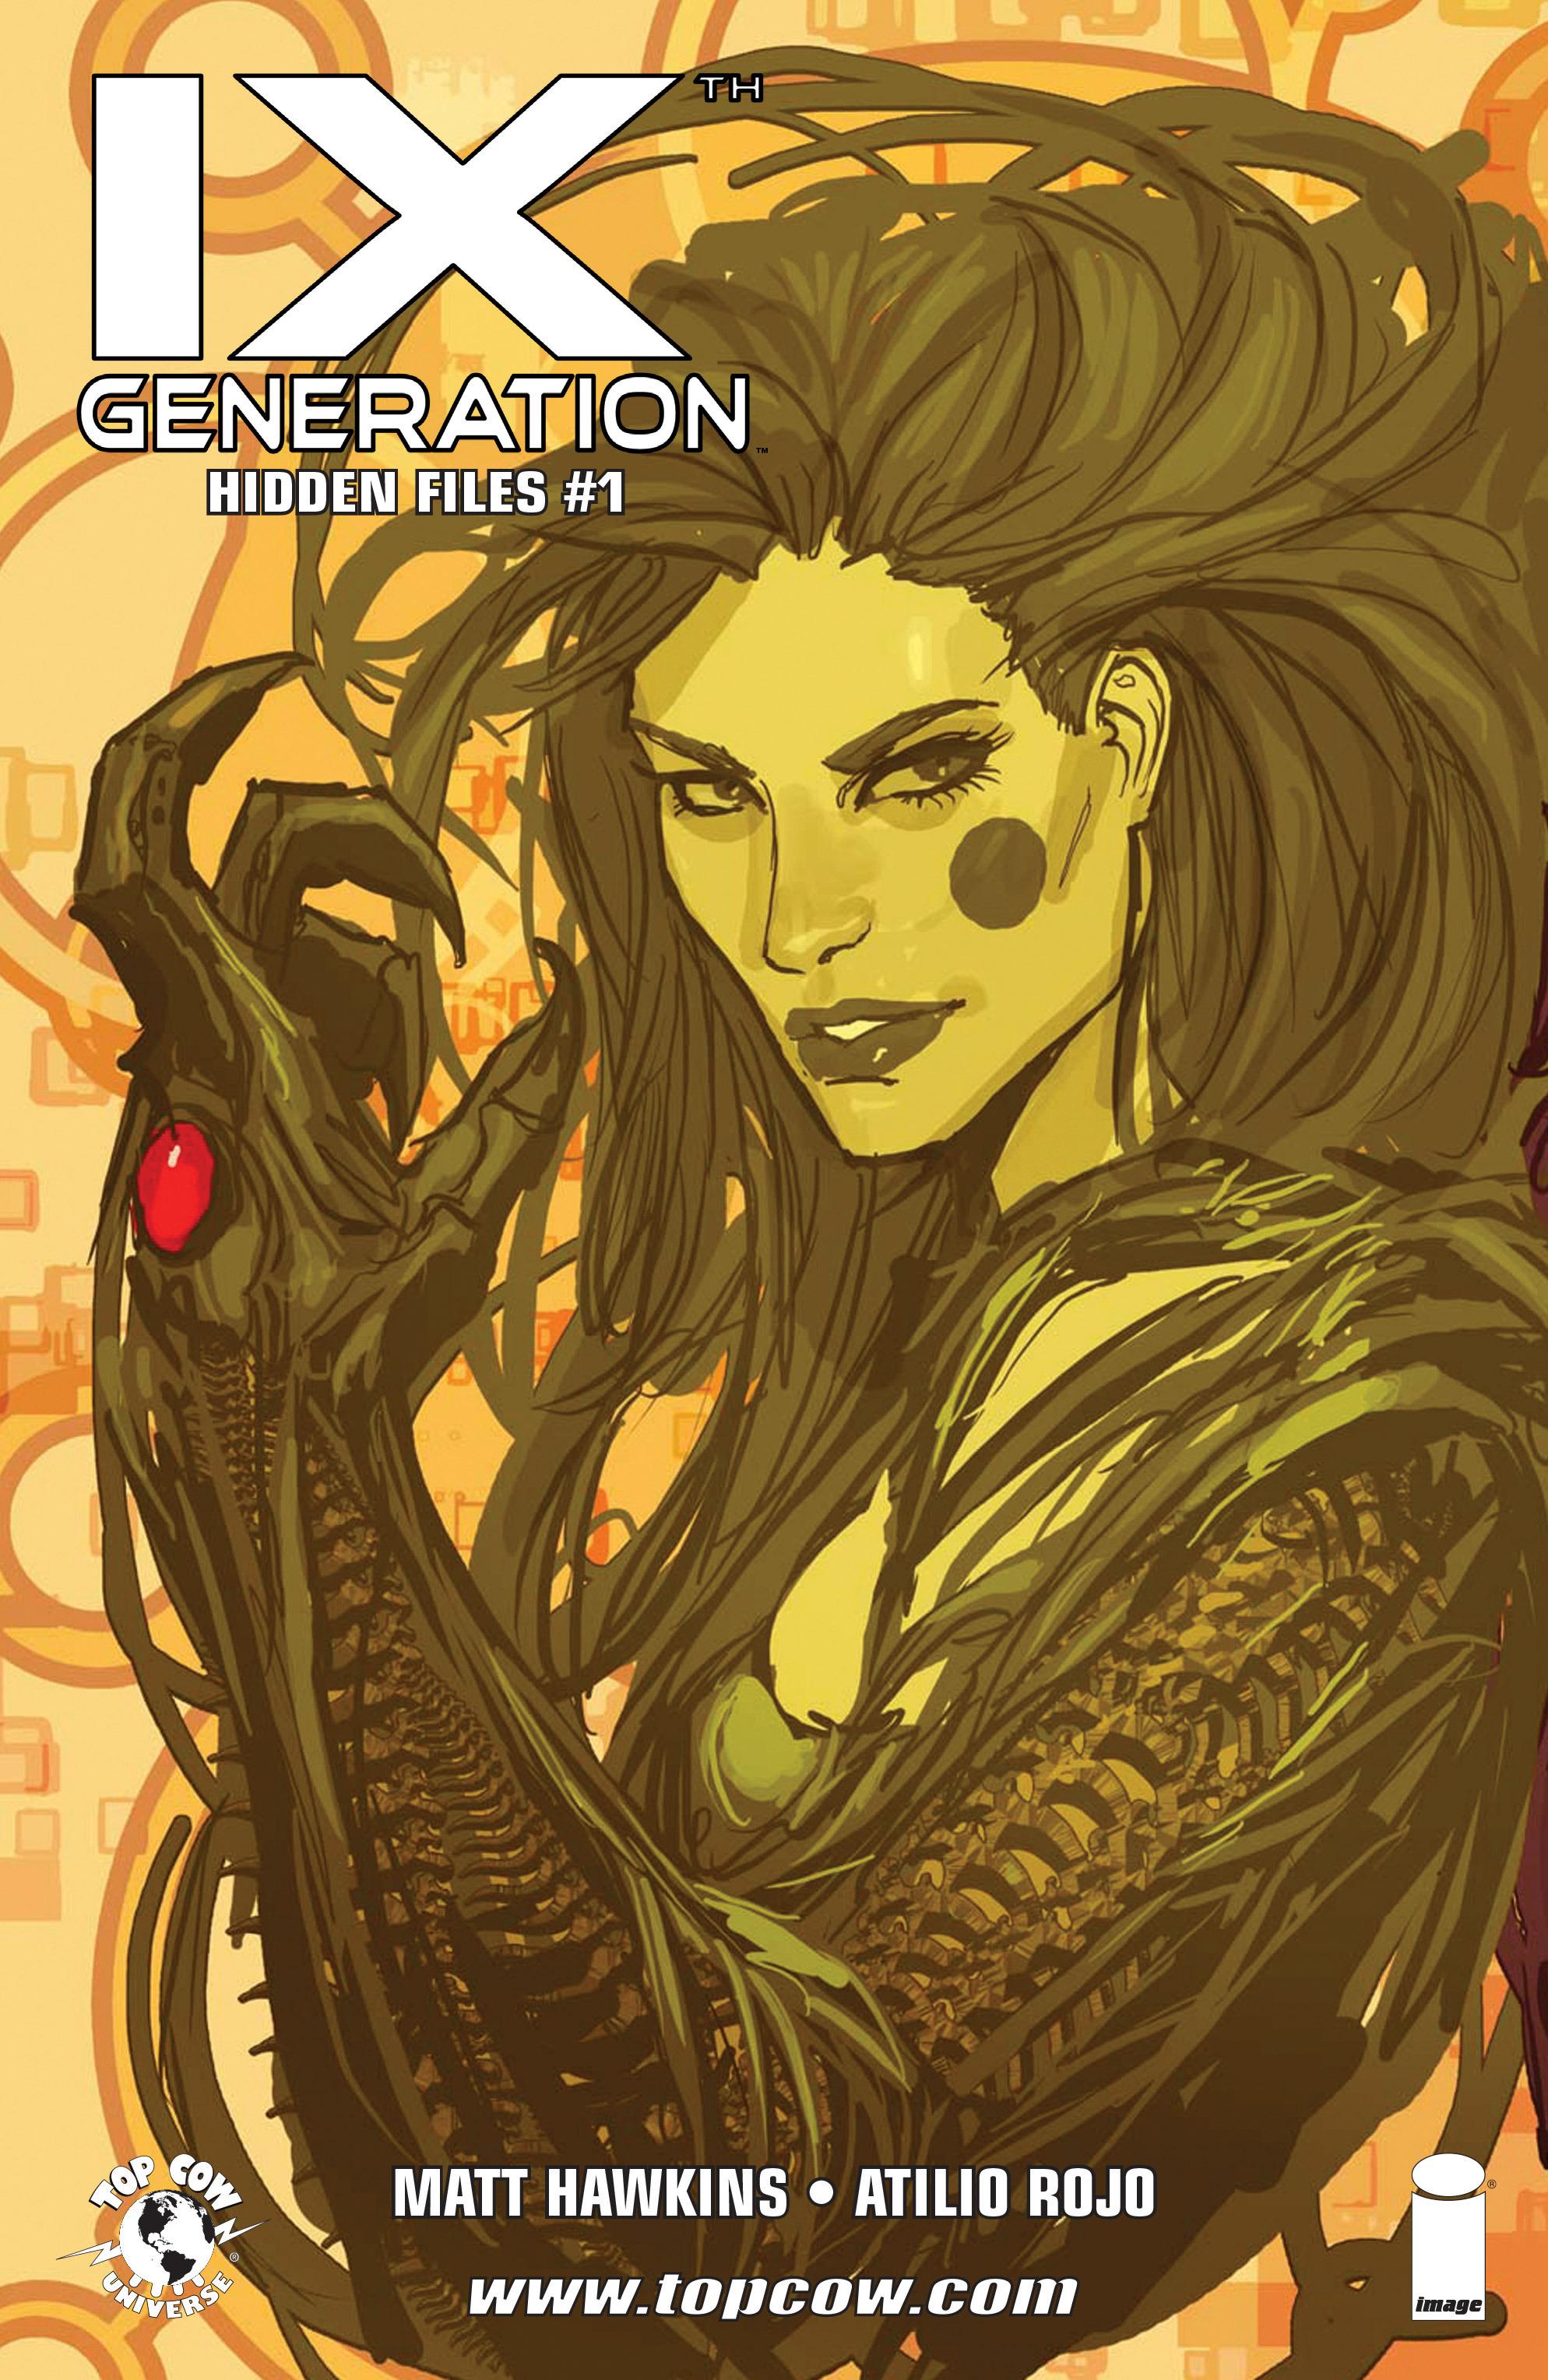 Read online IXth Generation Hidden Files comic -  Issue #1 - 1